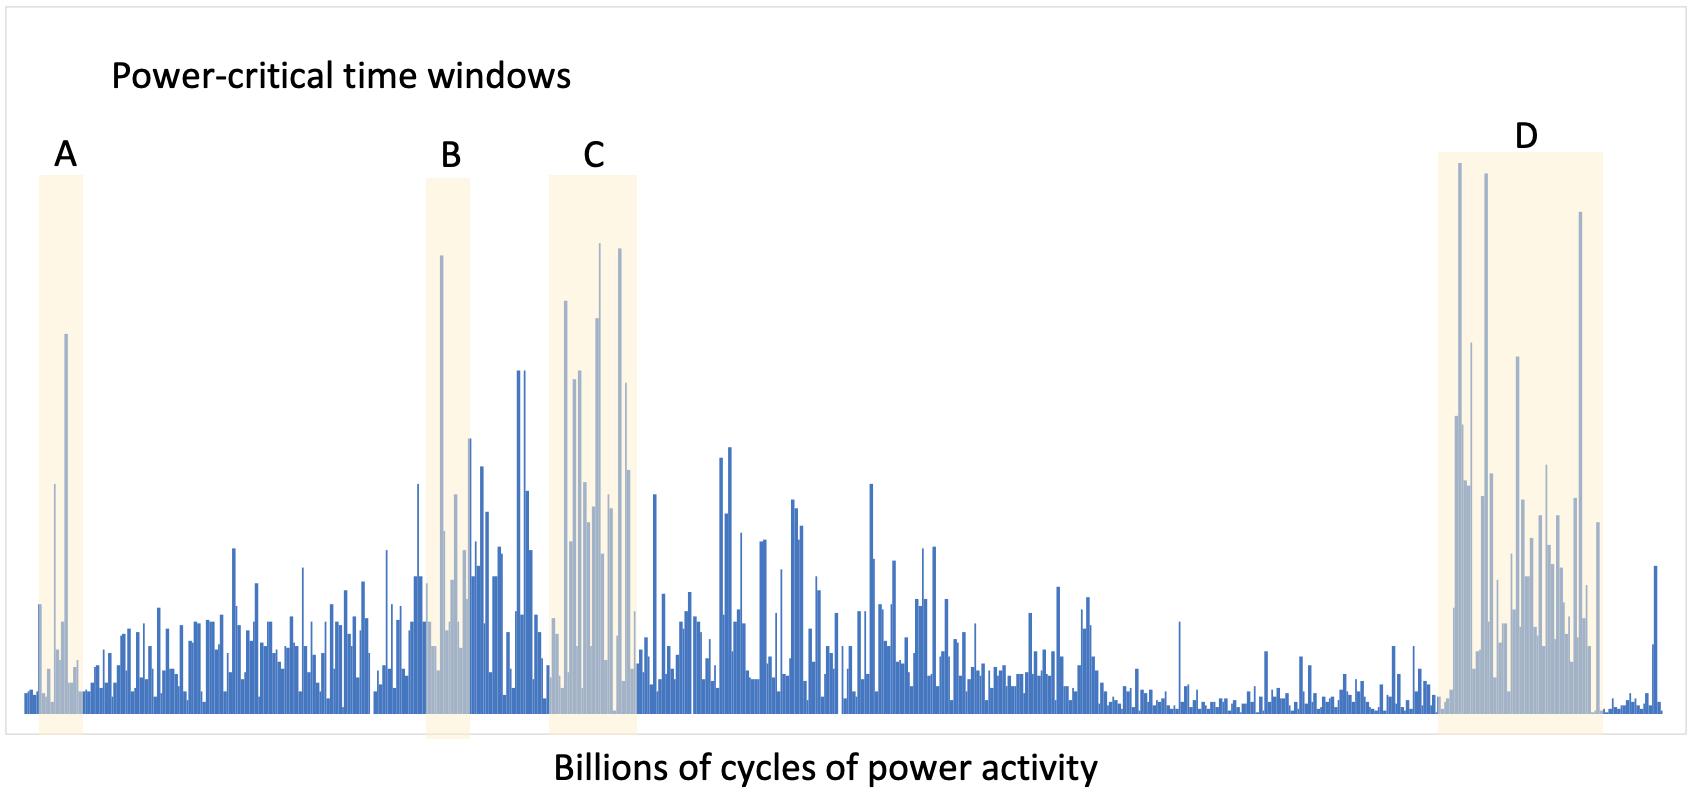 power activity billions